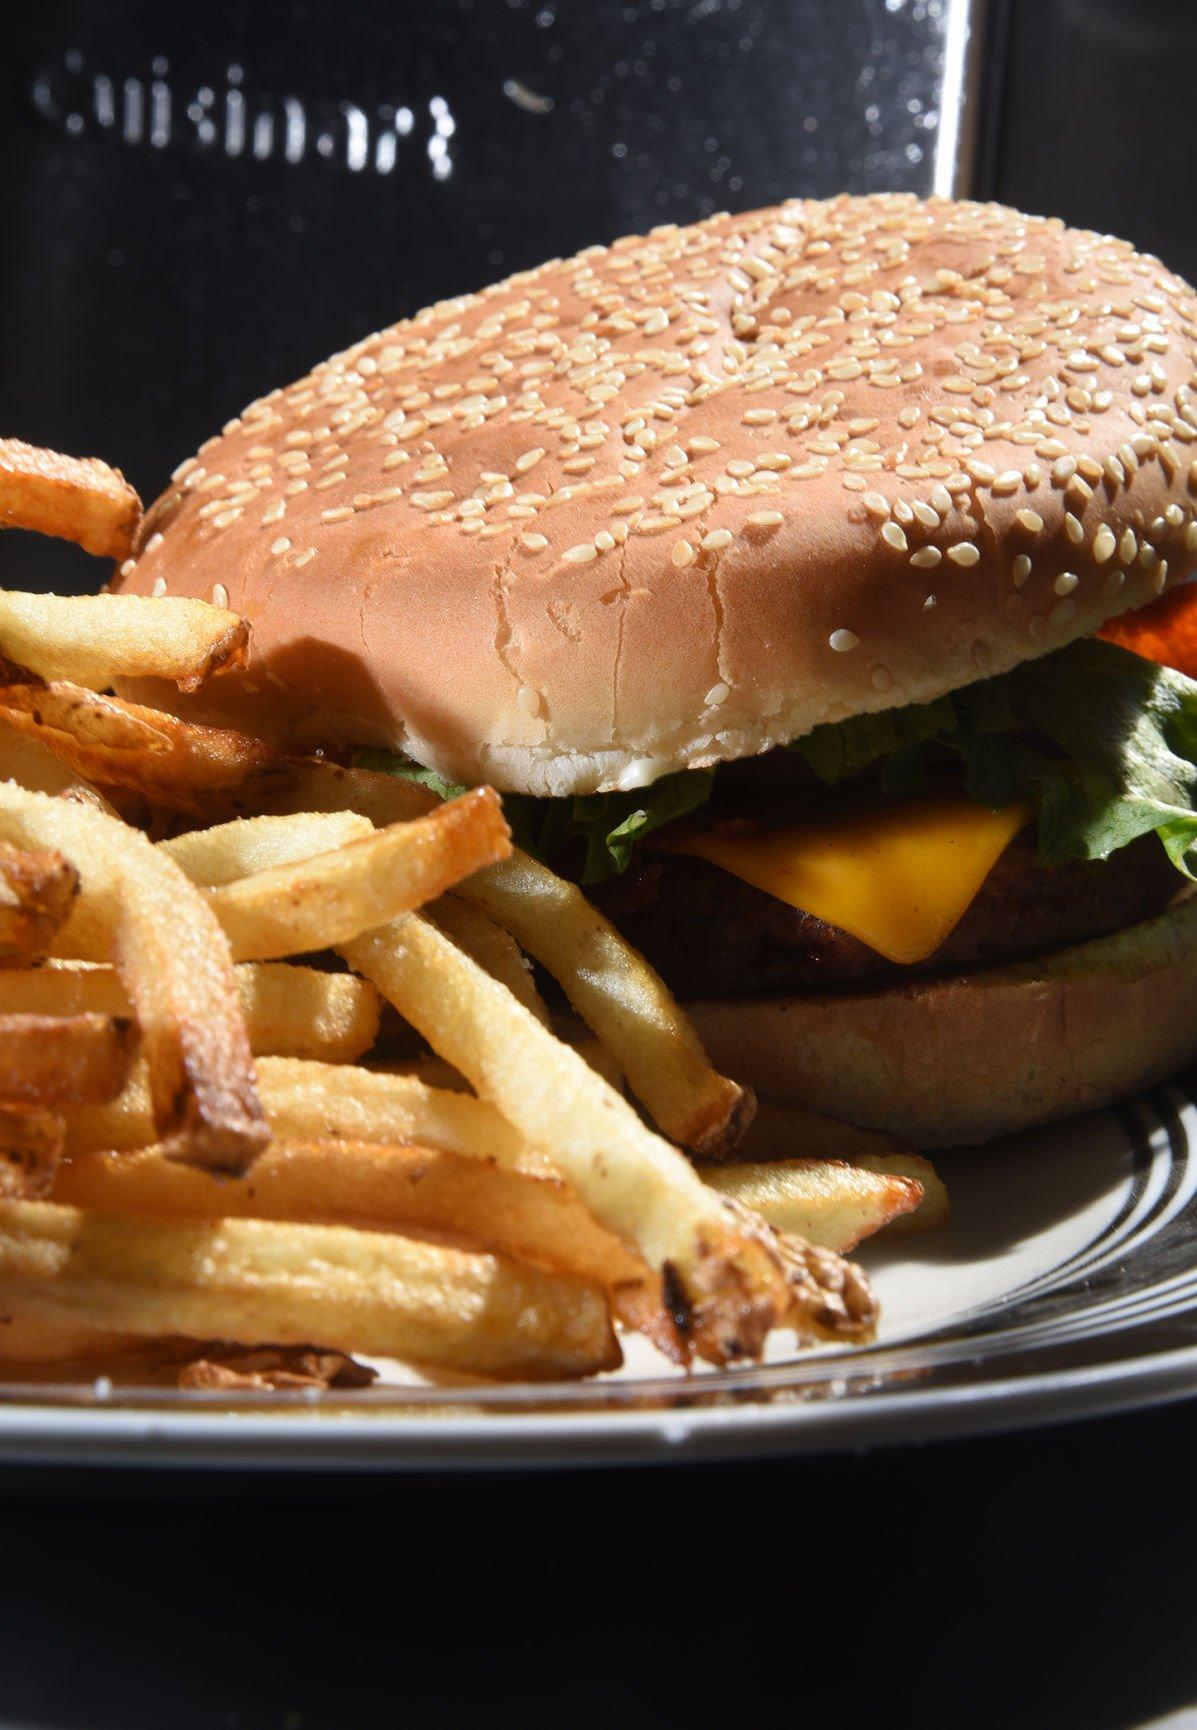 Yummy vegan fast food drive-through makes debut in Colorado Springs